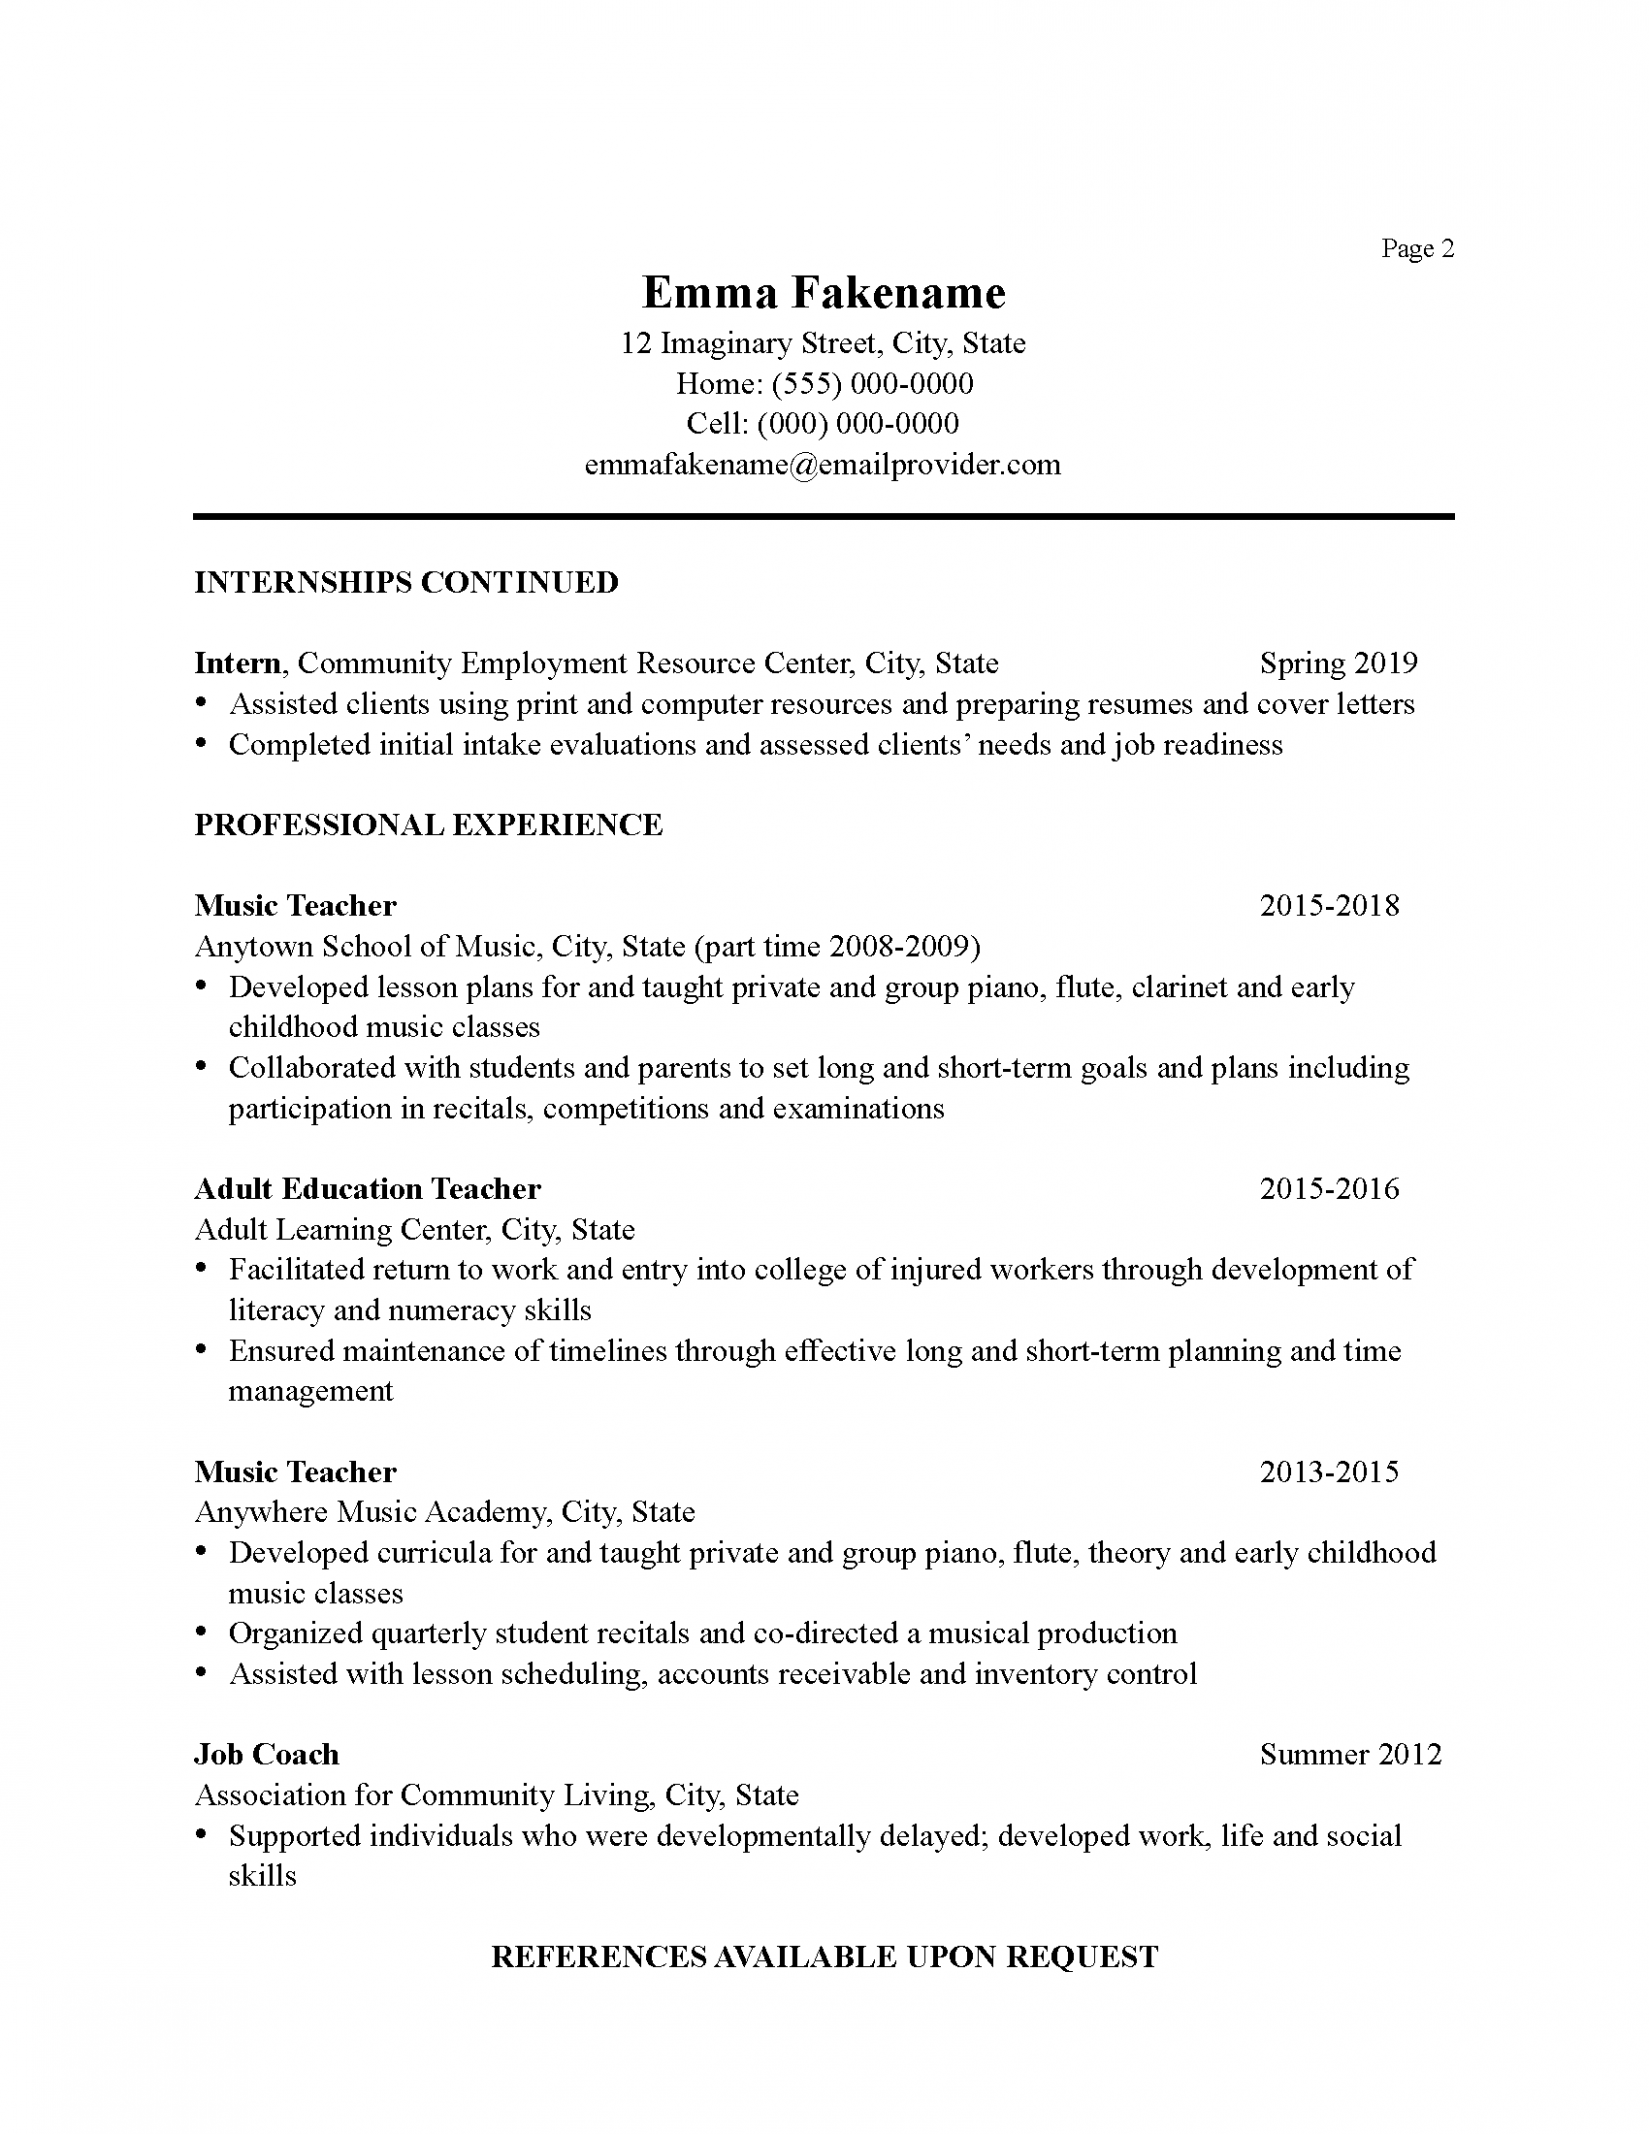 13 Job Vacancy Resume Format In 2020 Teacher Cover Letter Example Career Change Resume Resume Examples